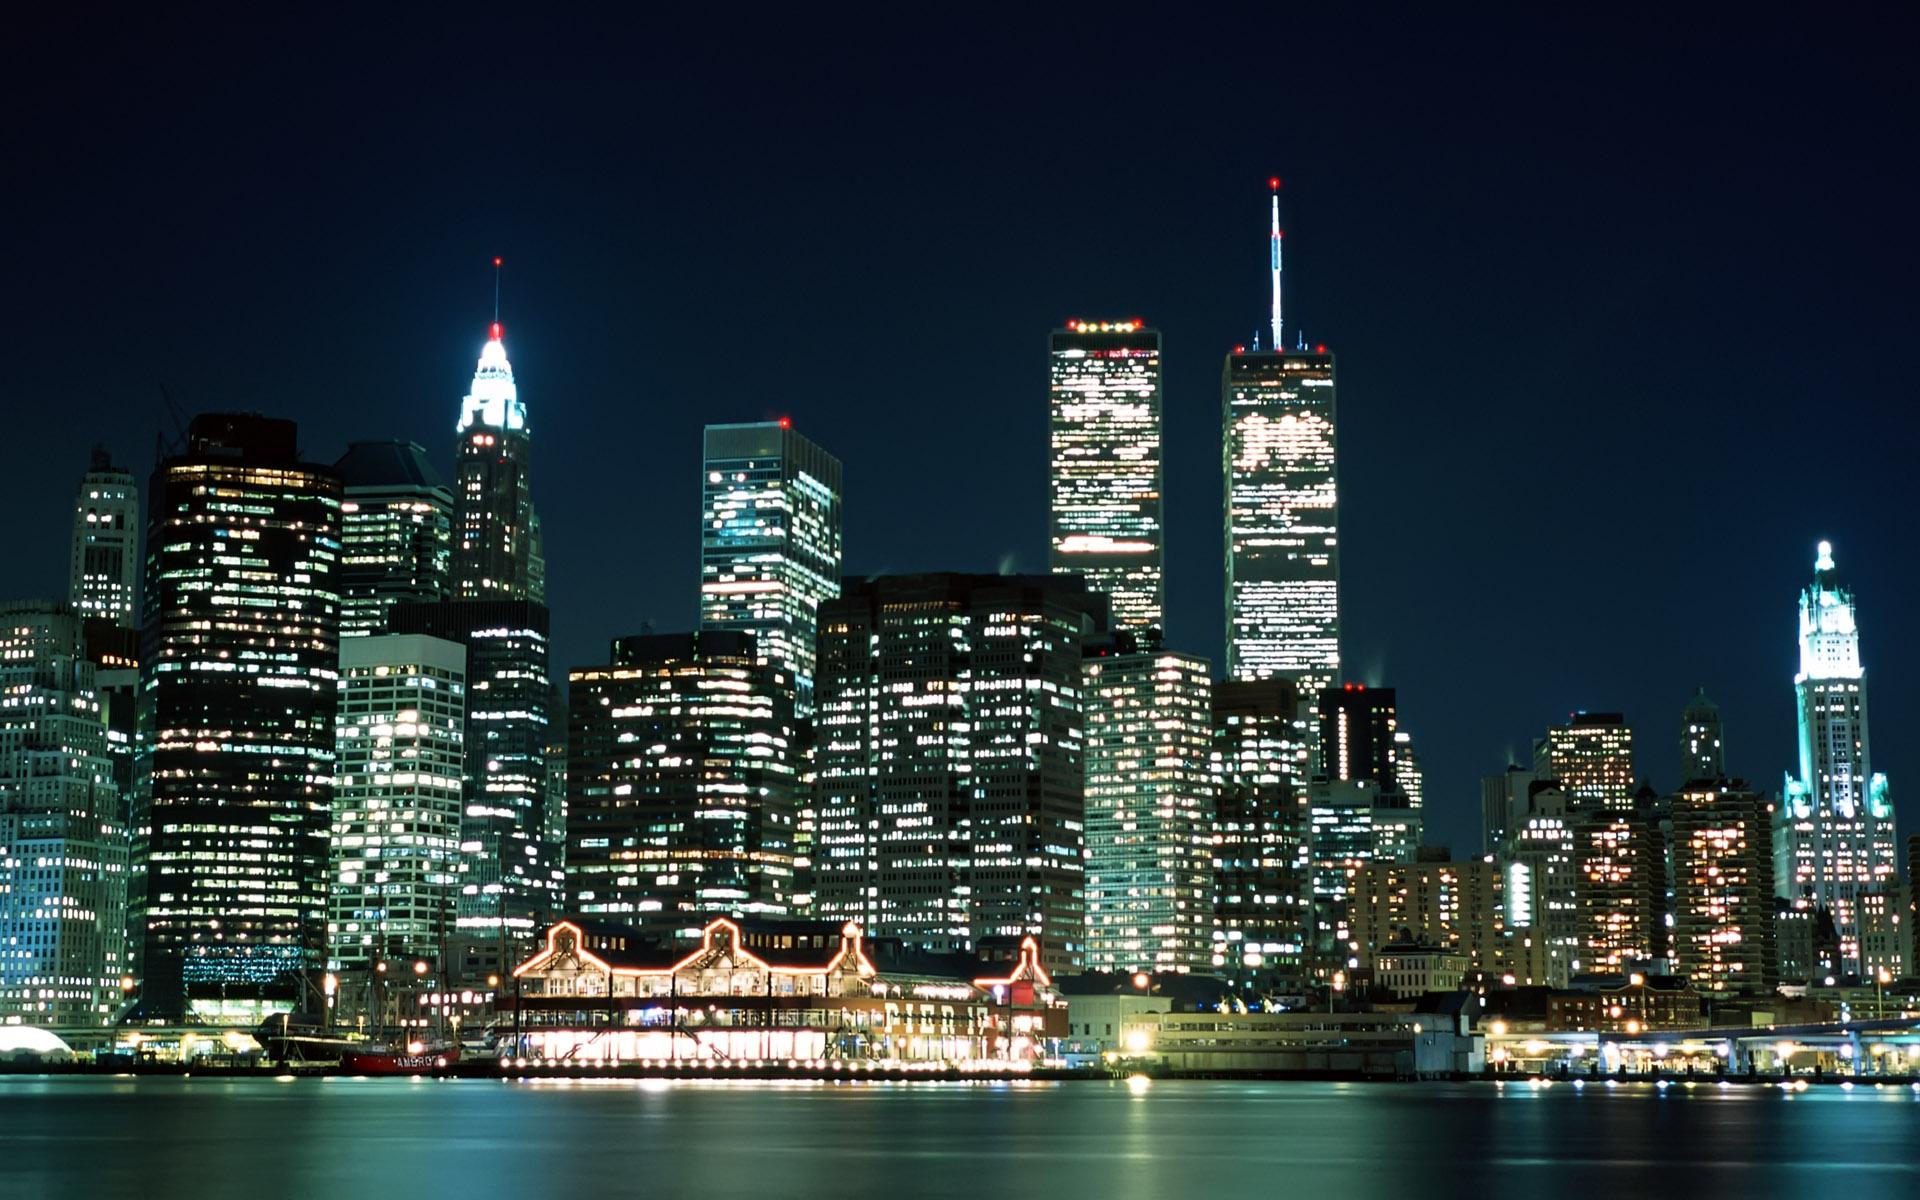 World USA New York  NY City lights   New York   USA 010840 jpg 1920x1200